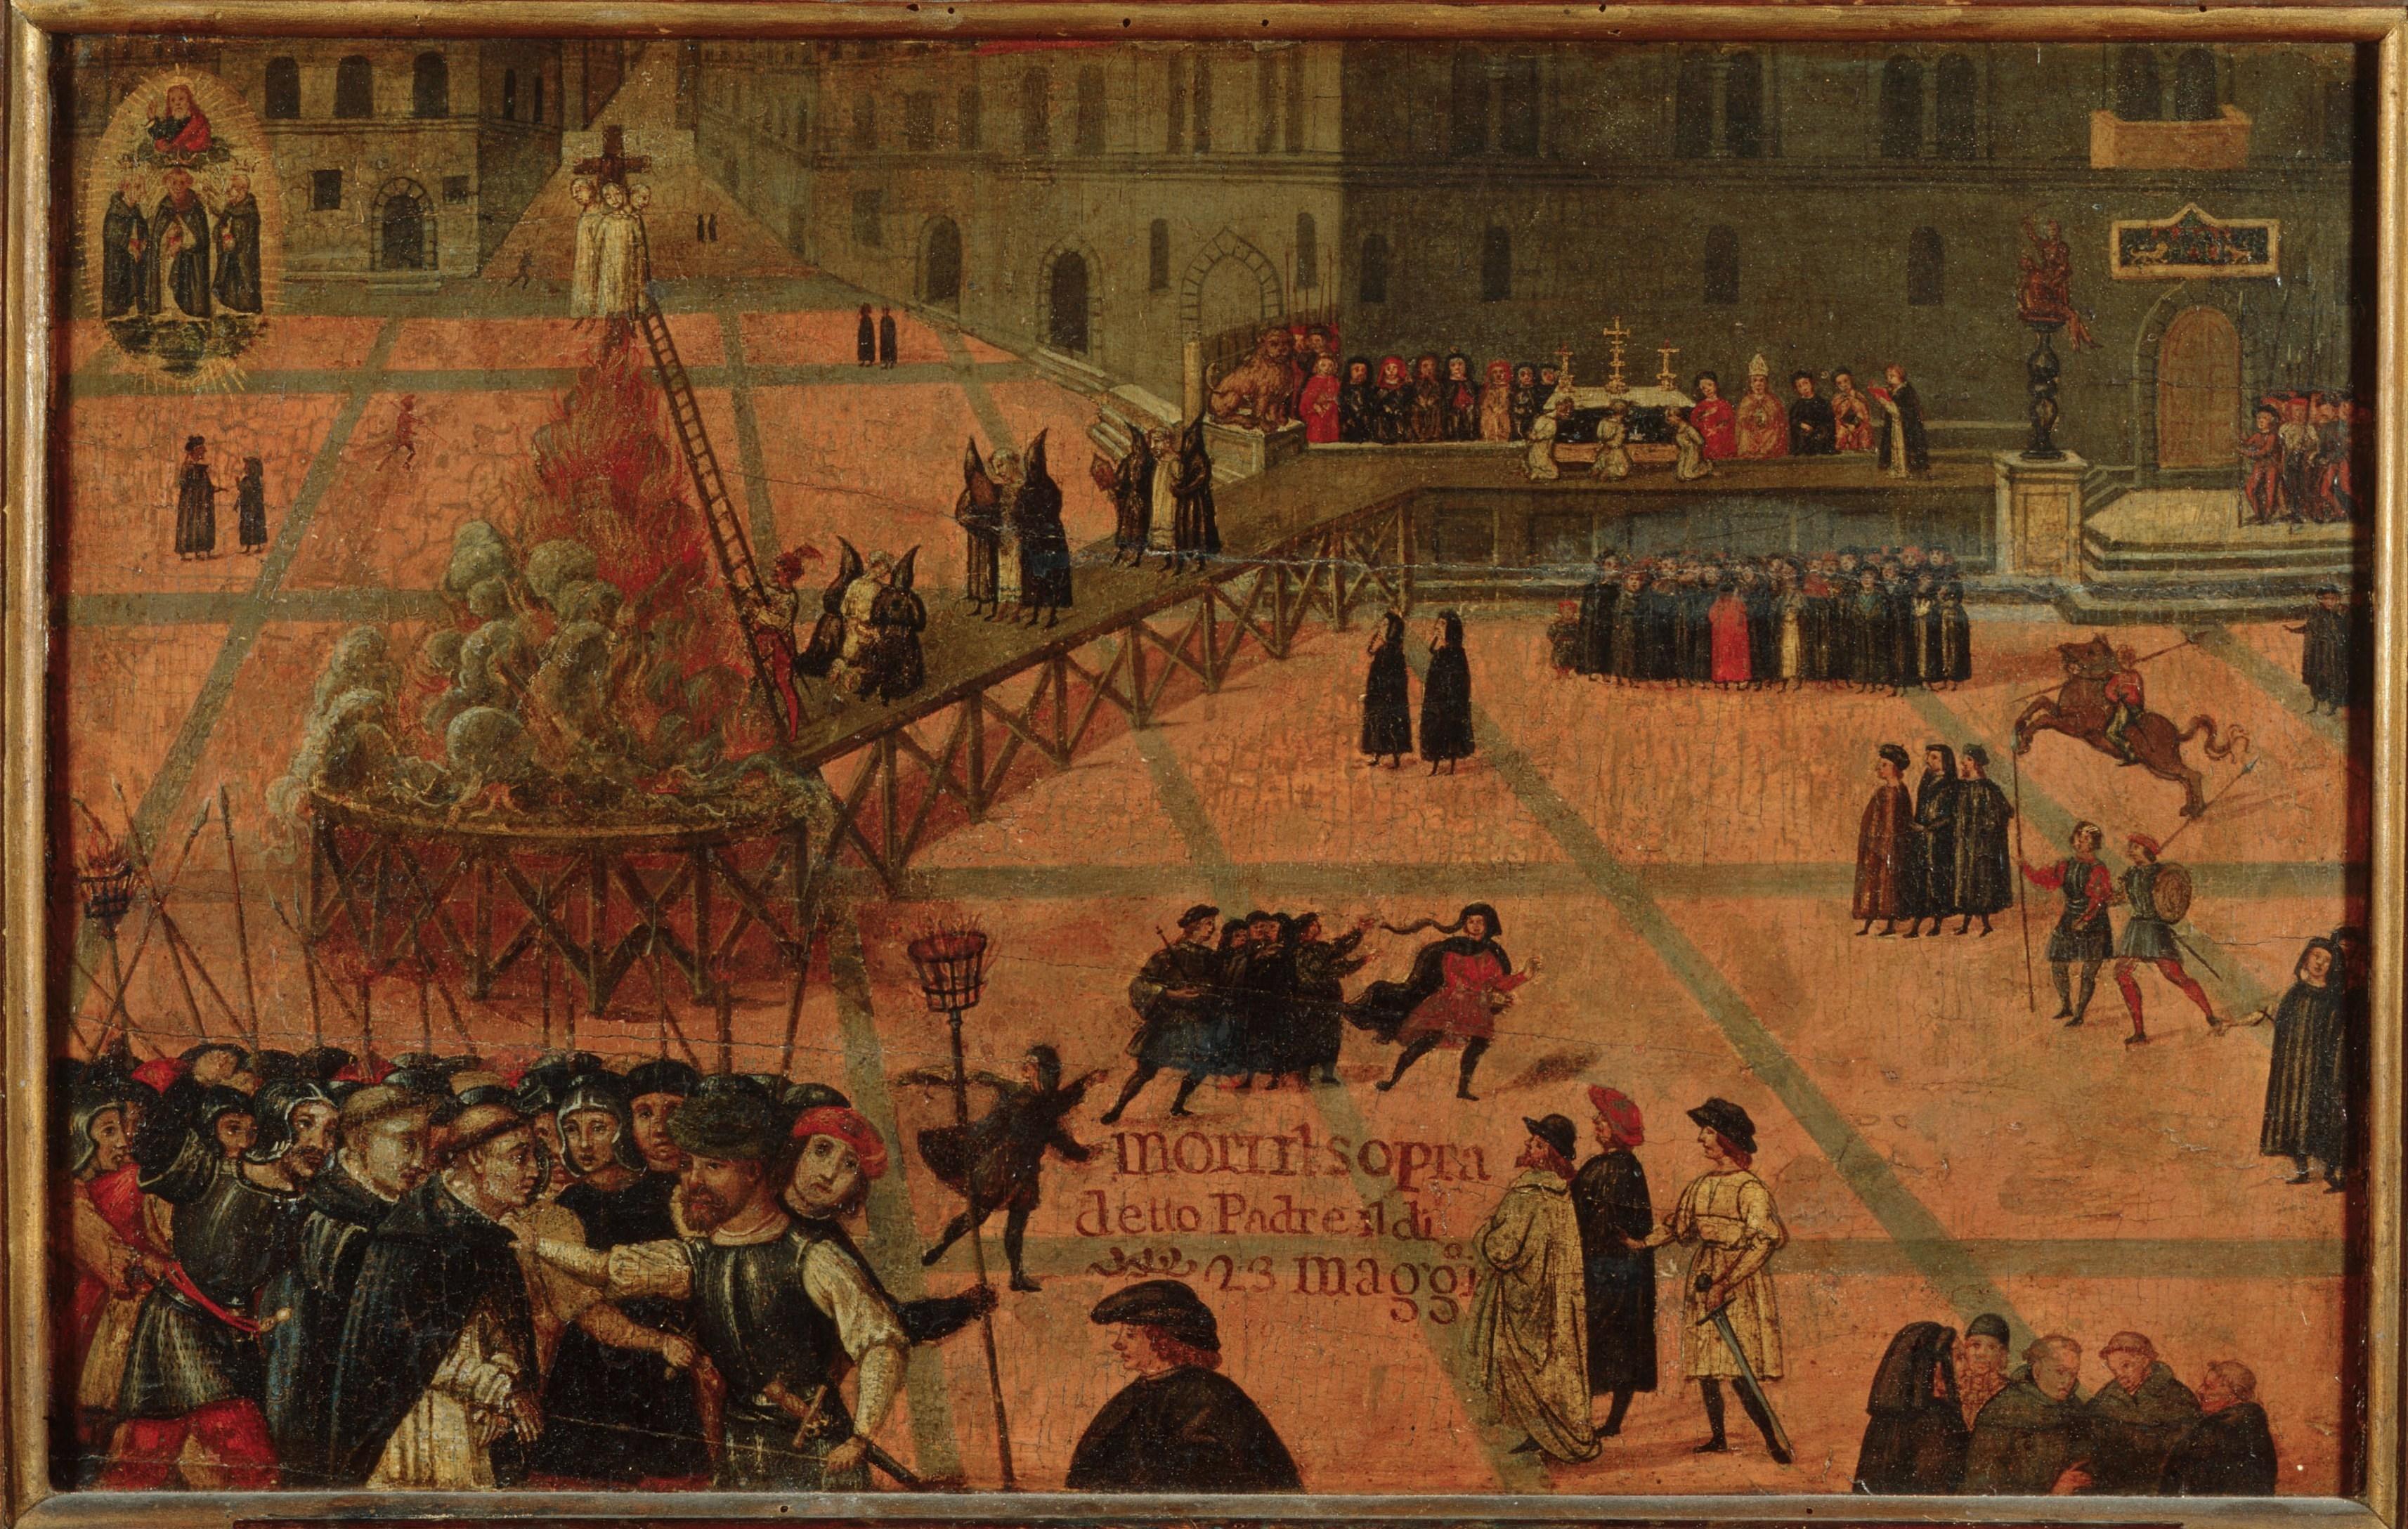 Filippo Dolciati (1443 - 1519) Execution of Girolamo Savonarola. 1498, Florence, Museo di San Marco.jpg